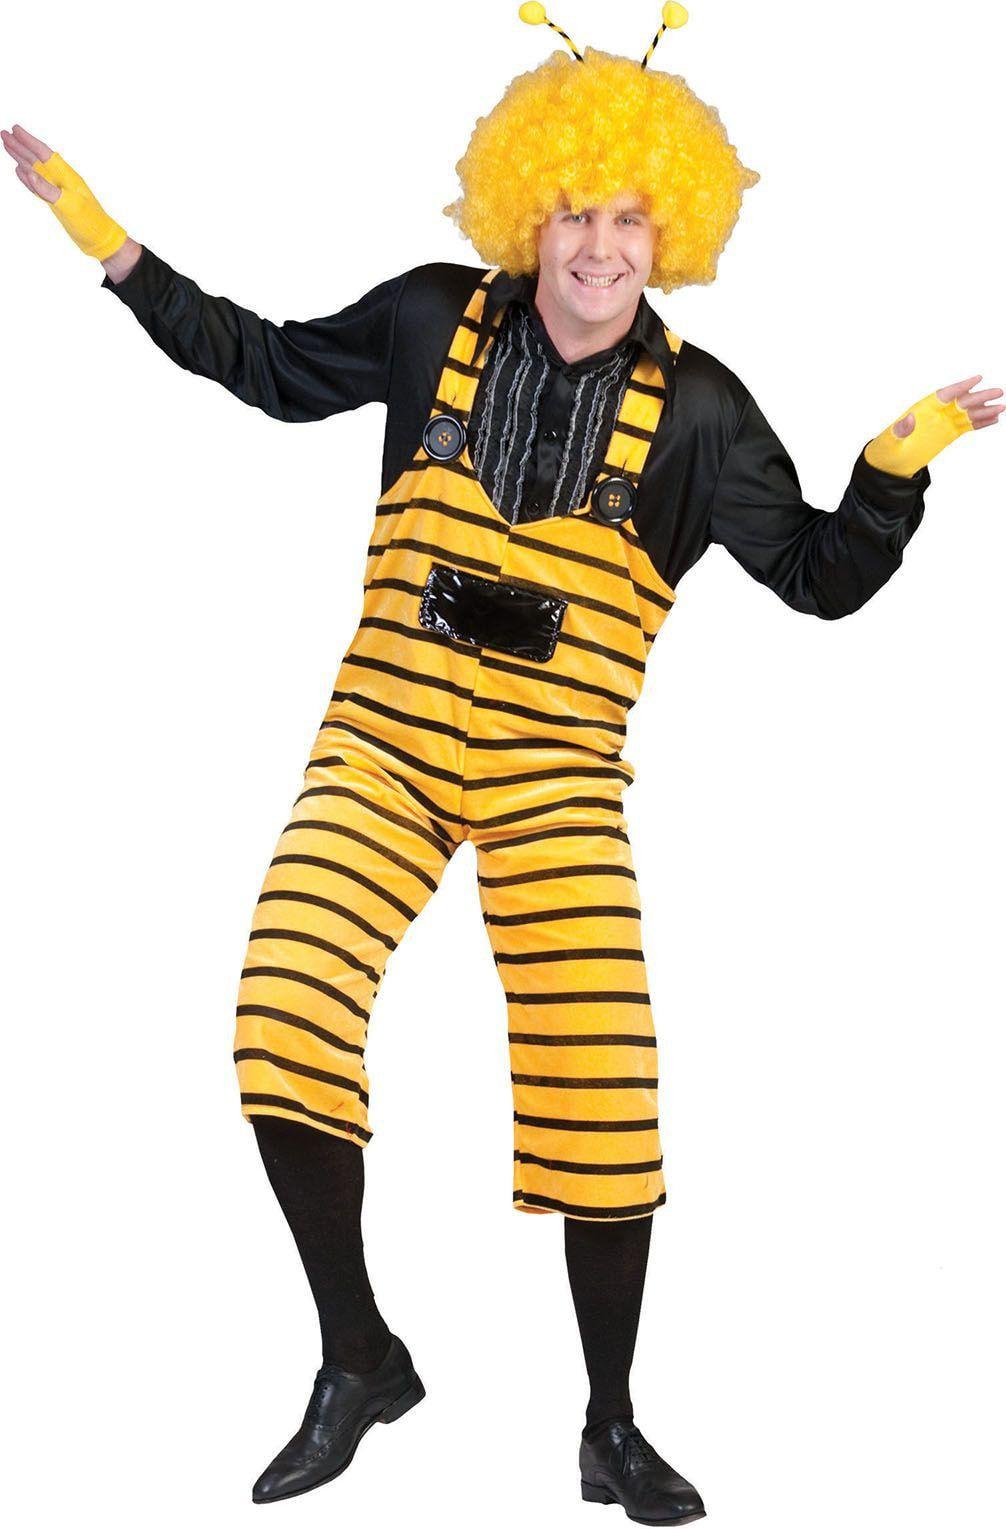 Bzz Bzz Buzzy Overall Man Kostuum